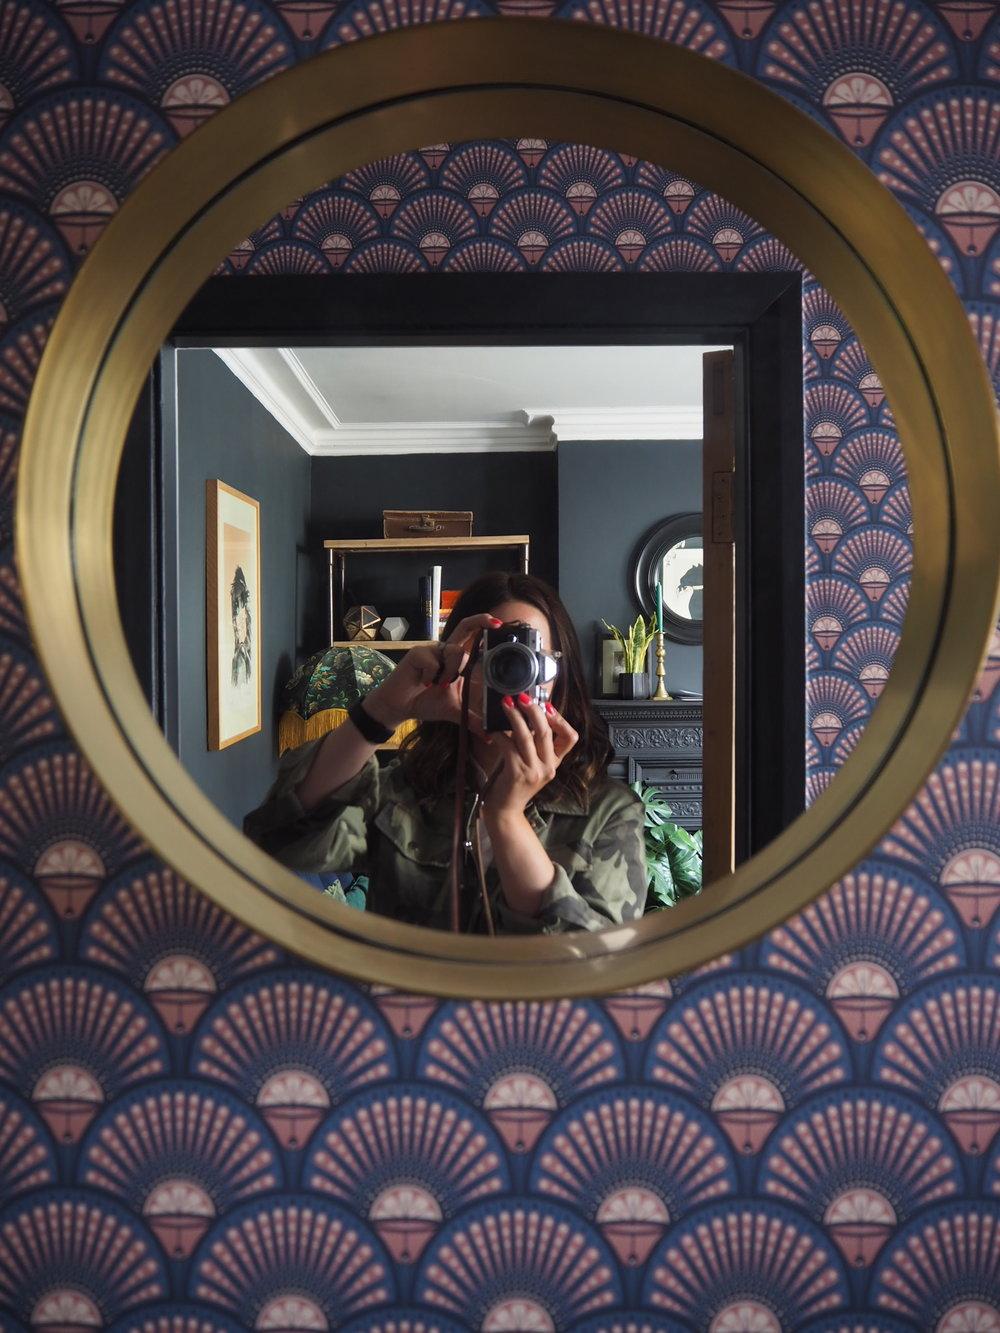 Amanda Cotton selfie